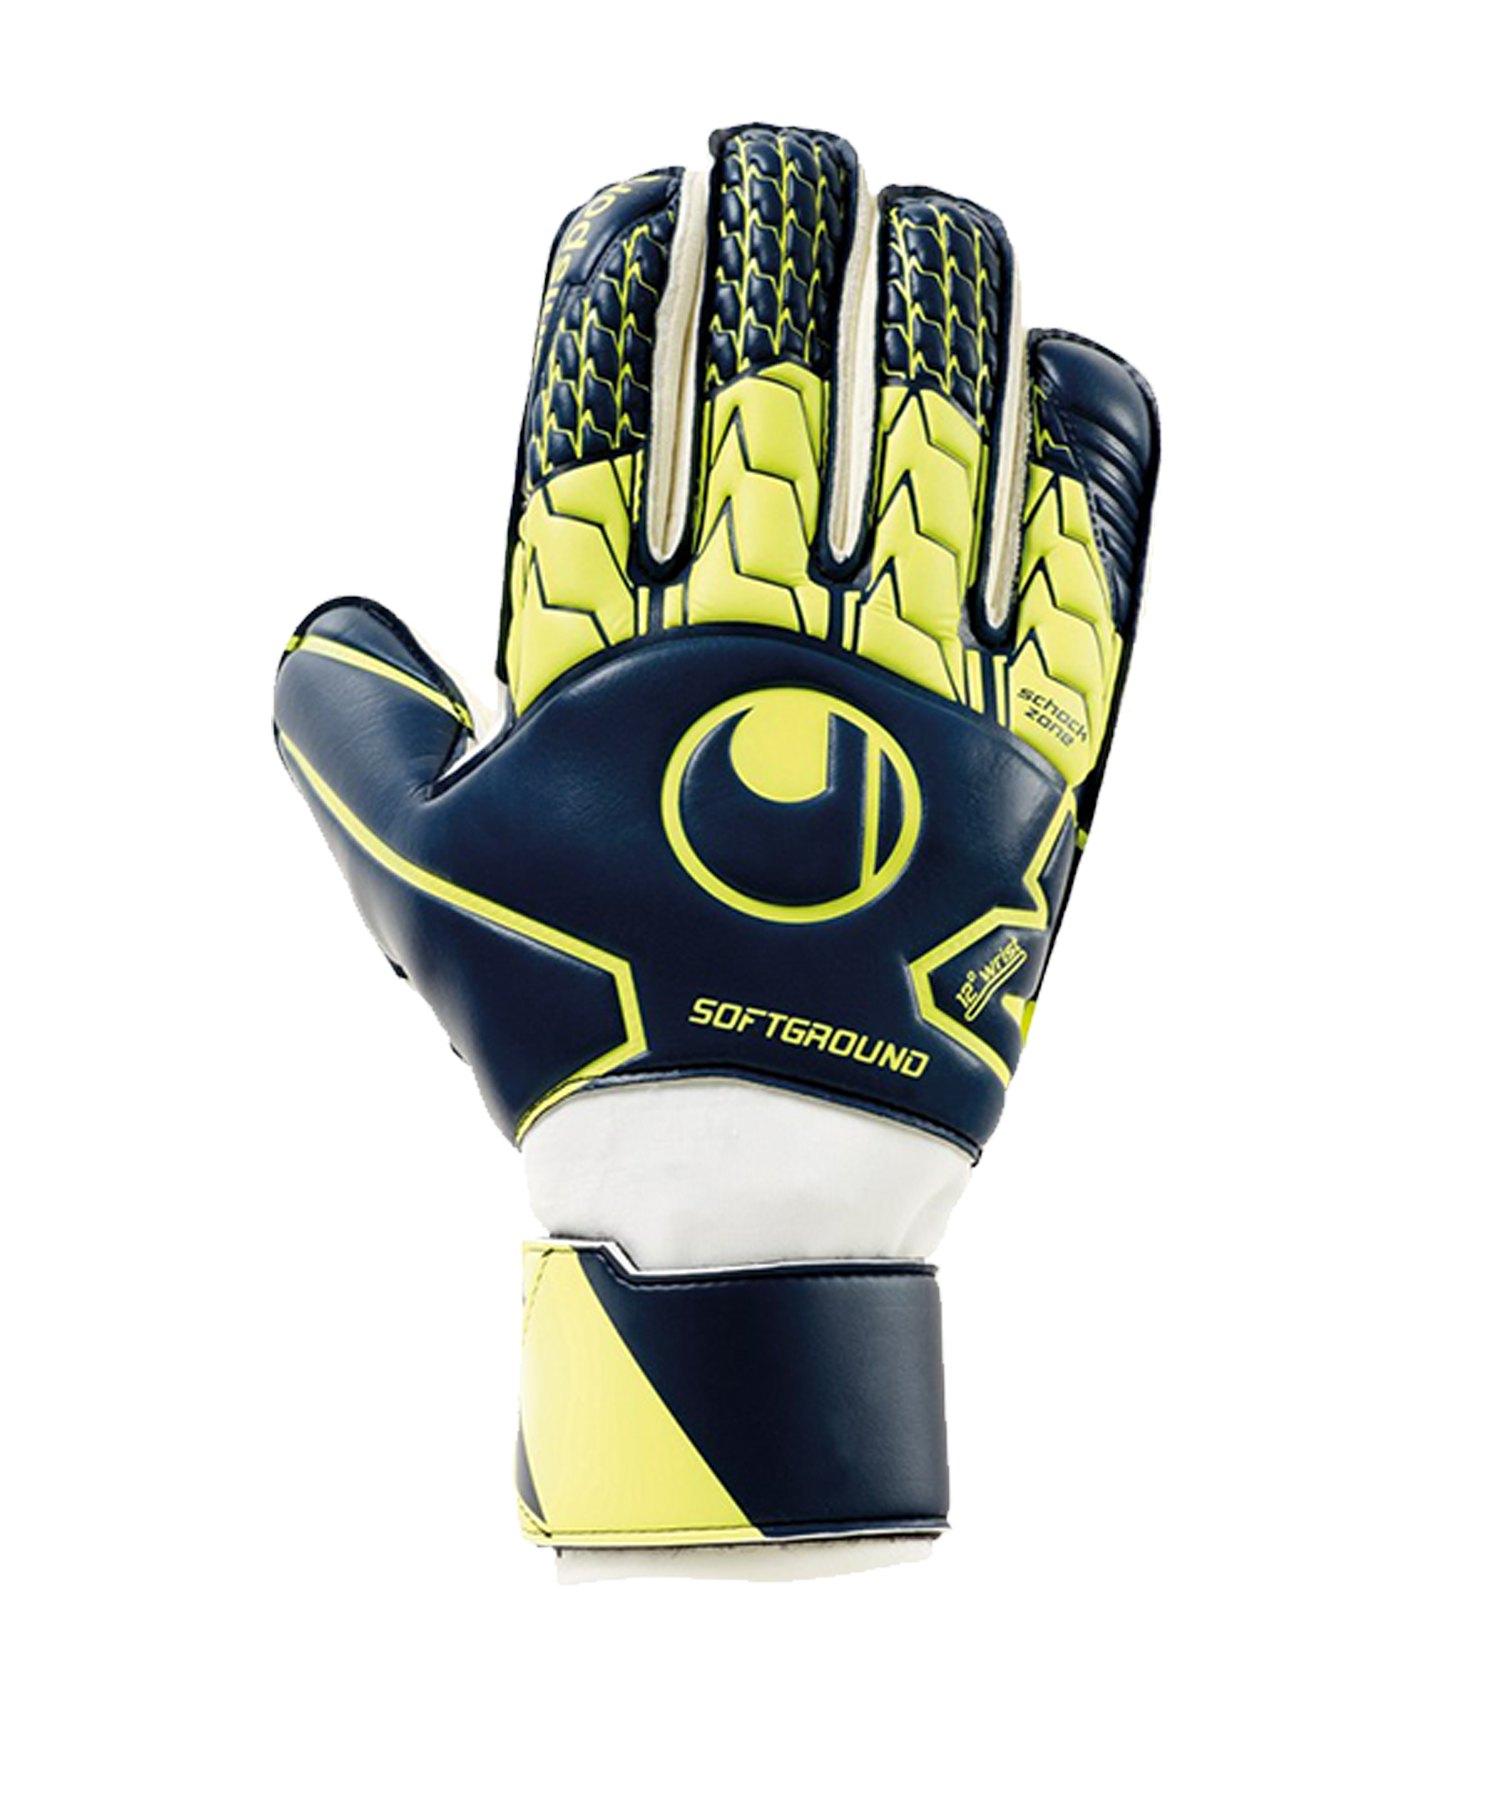 Uhlsport Soft RF Handschuh F01 - Blau